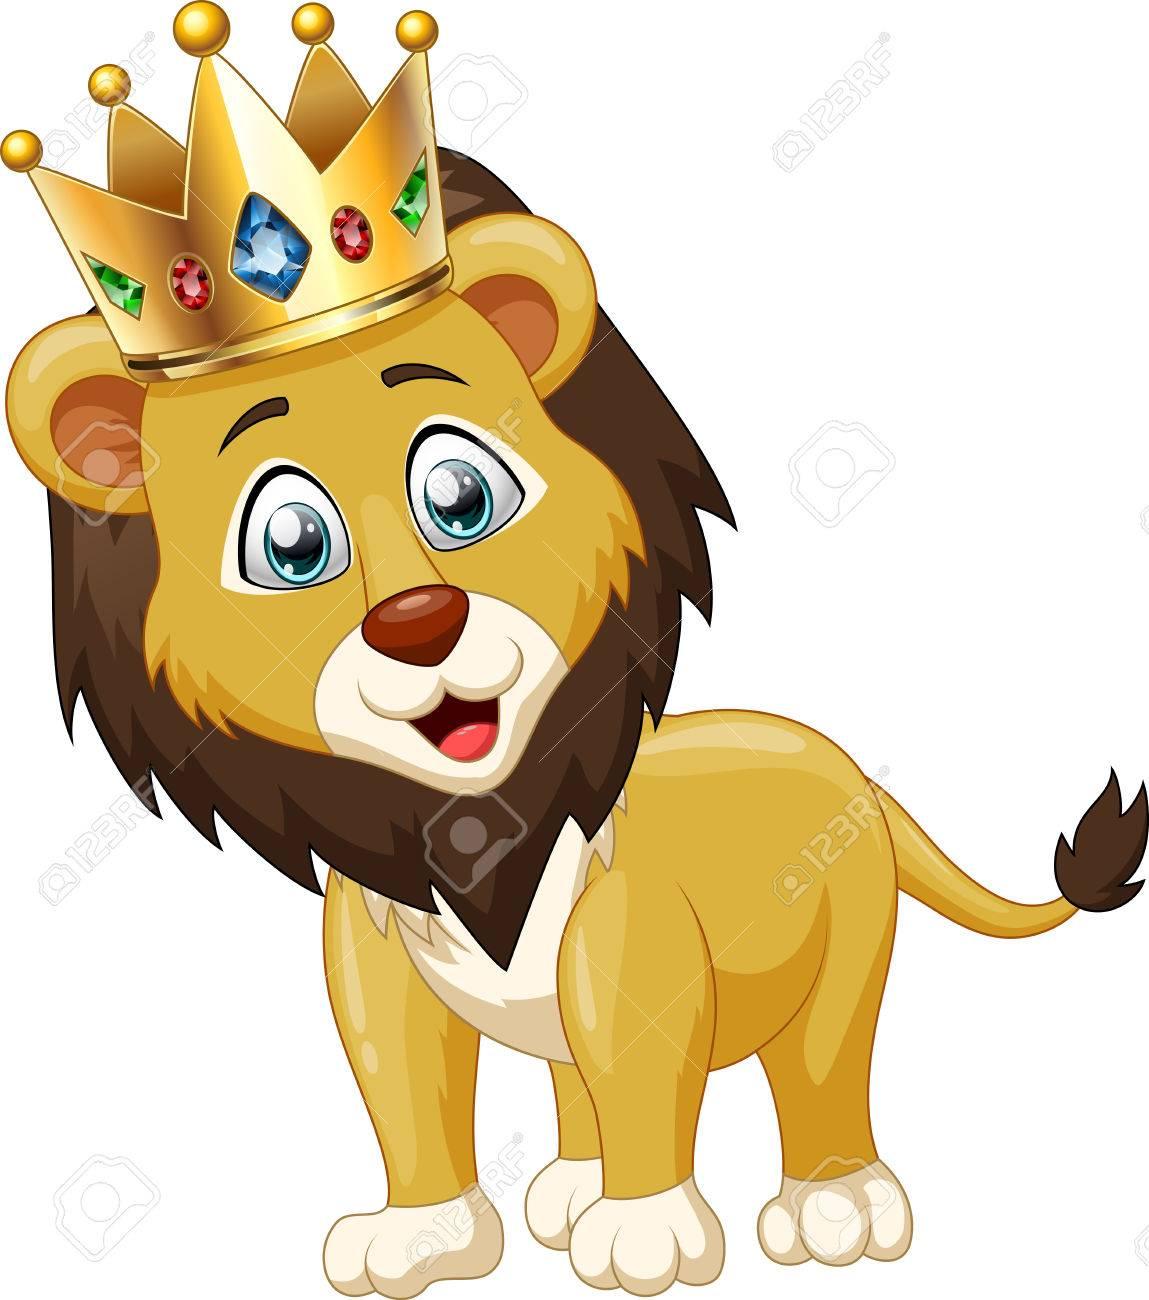 Cute lion king cartoon. Vector illustration.